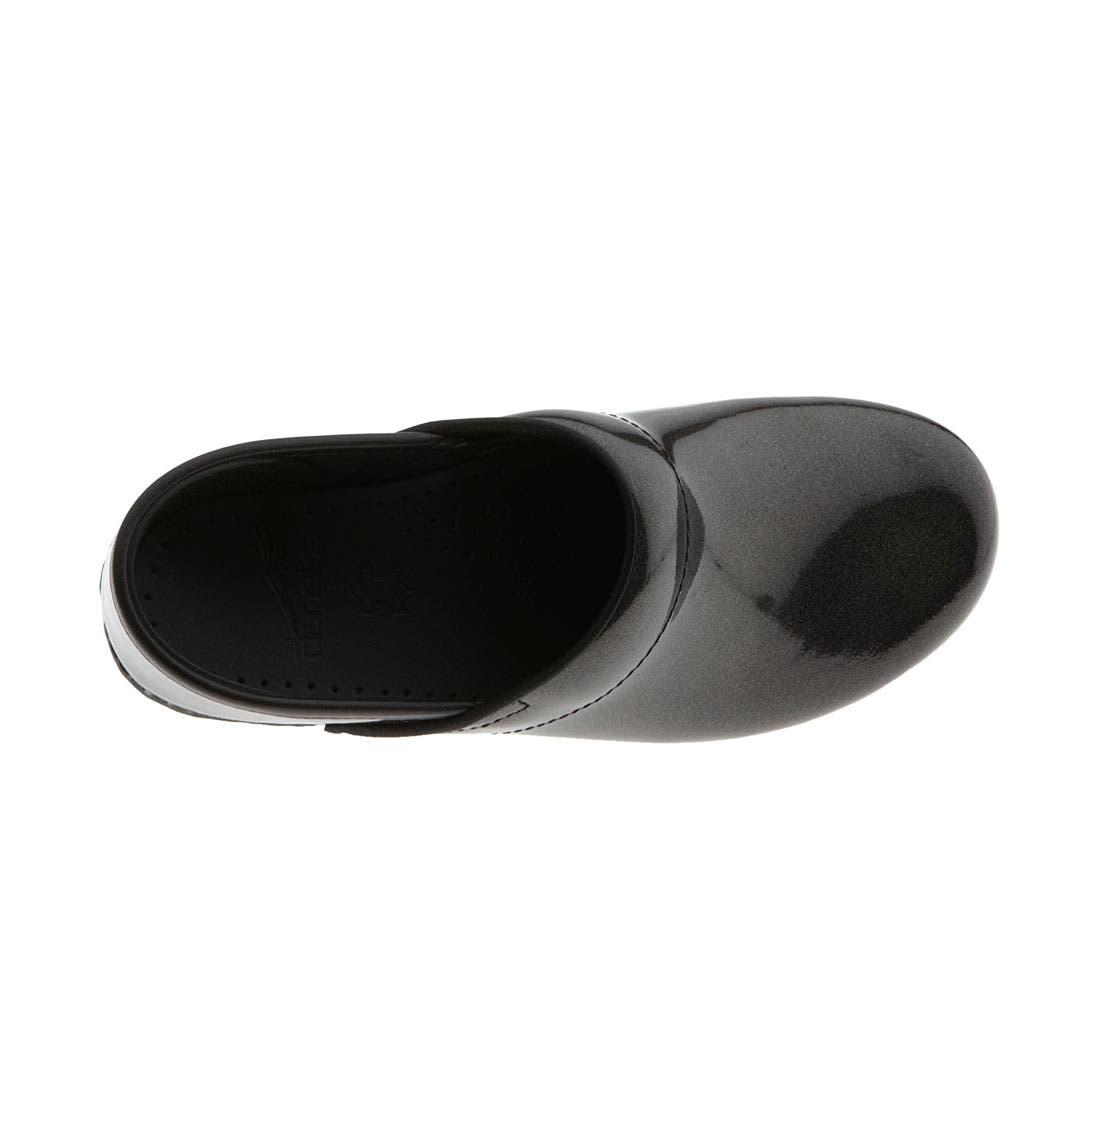 Alternate Image 3  - Dansko 'Professional Prism' Patent Leather Clog